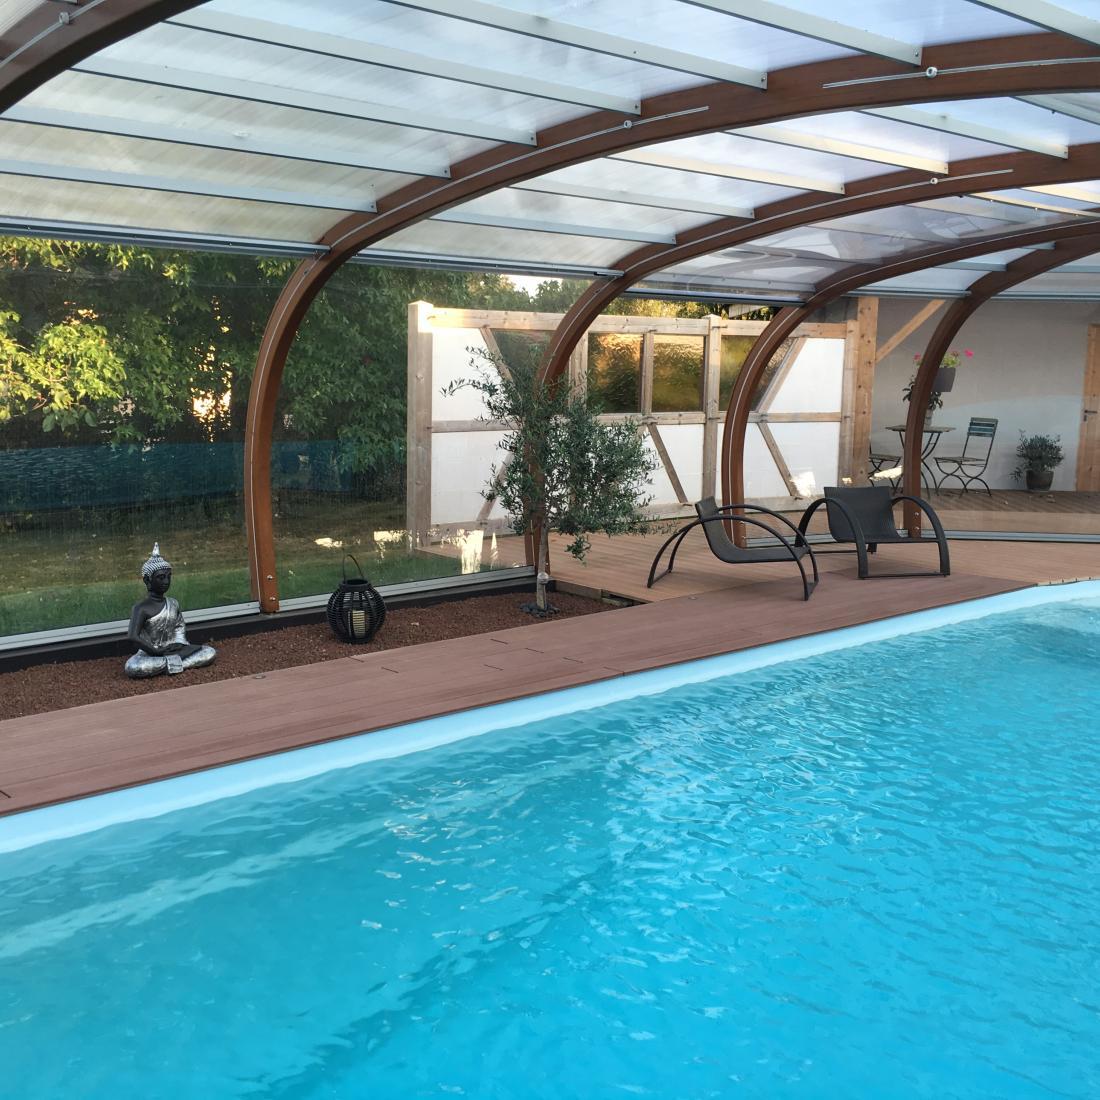 Abri piscine avec rotonde abris bois apc france for Abris piscine bois